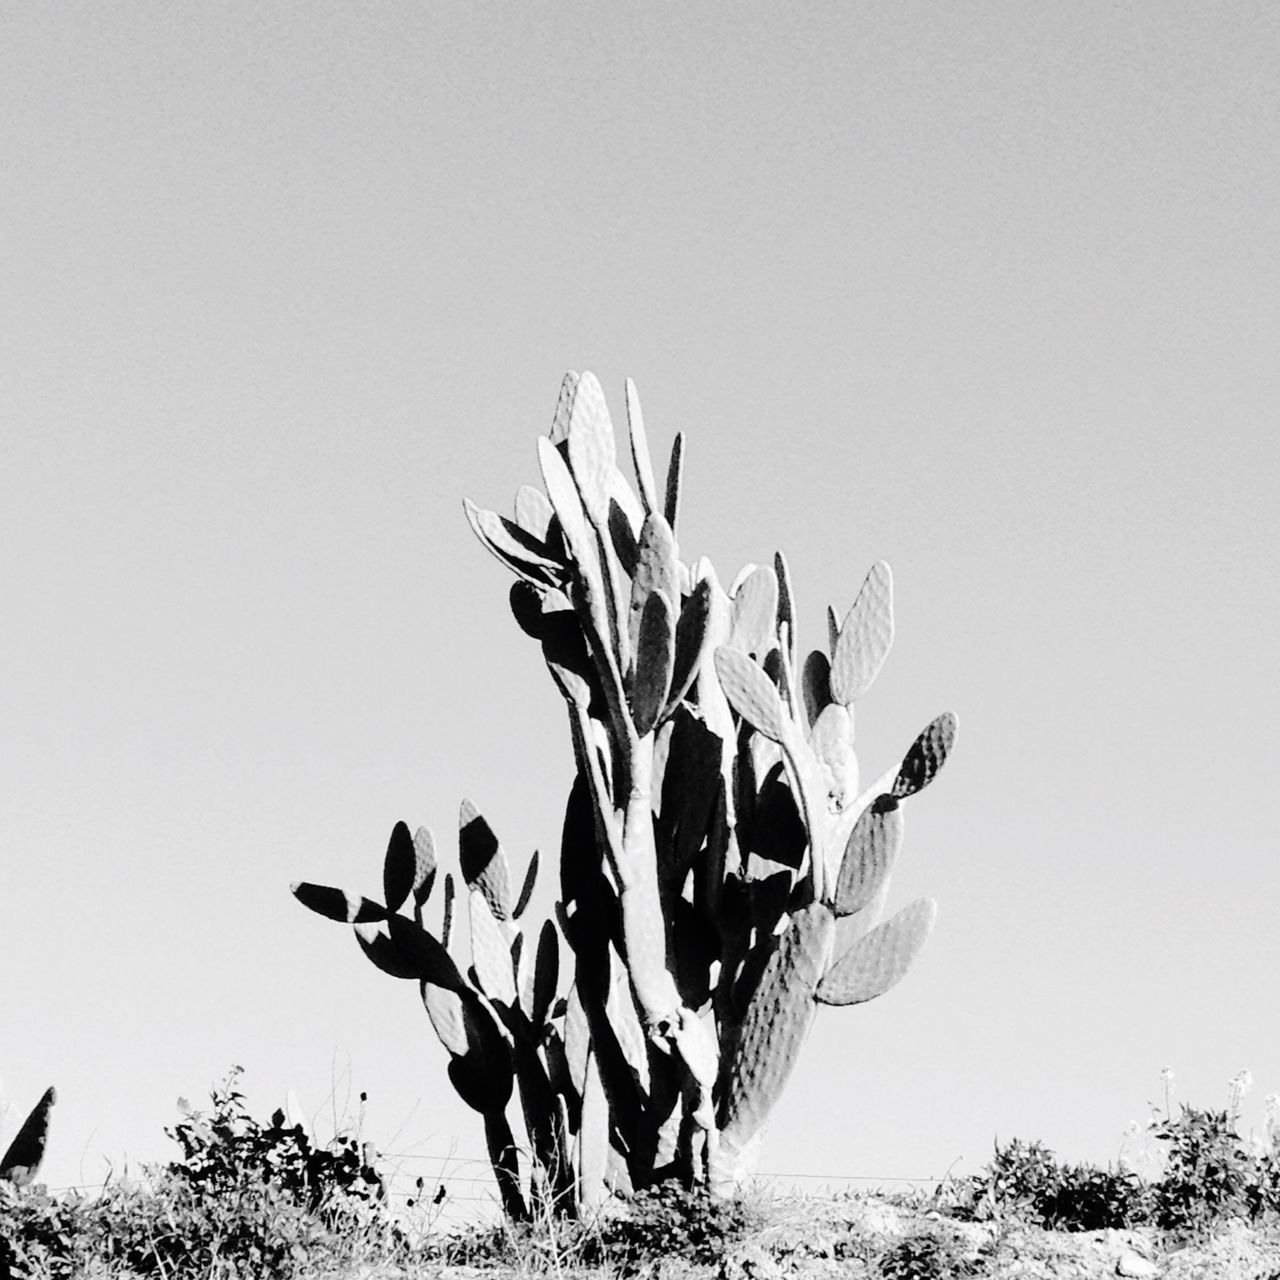 Cactus On Field Against Clear Sky